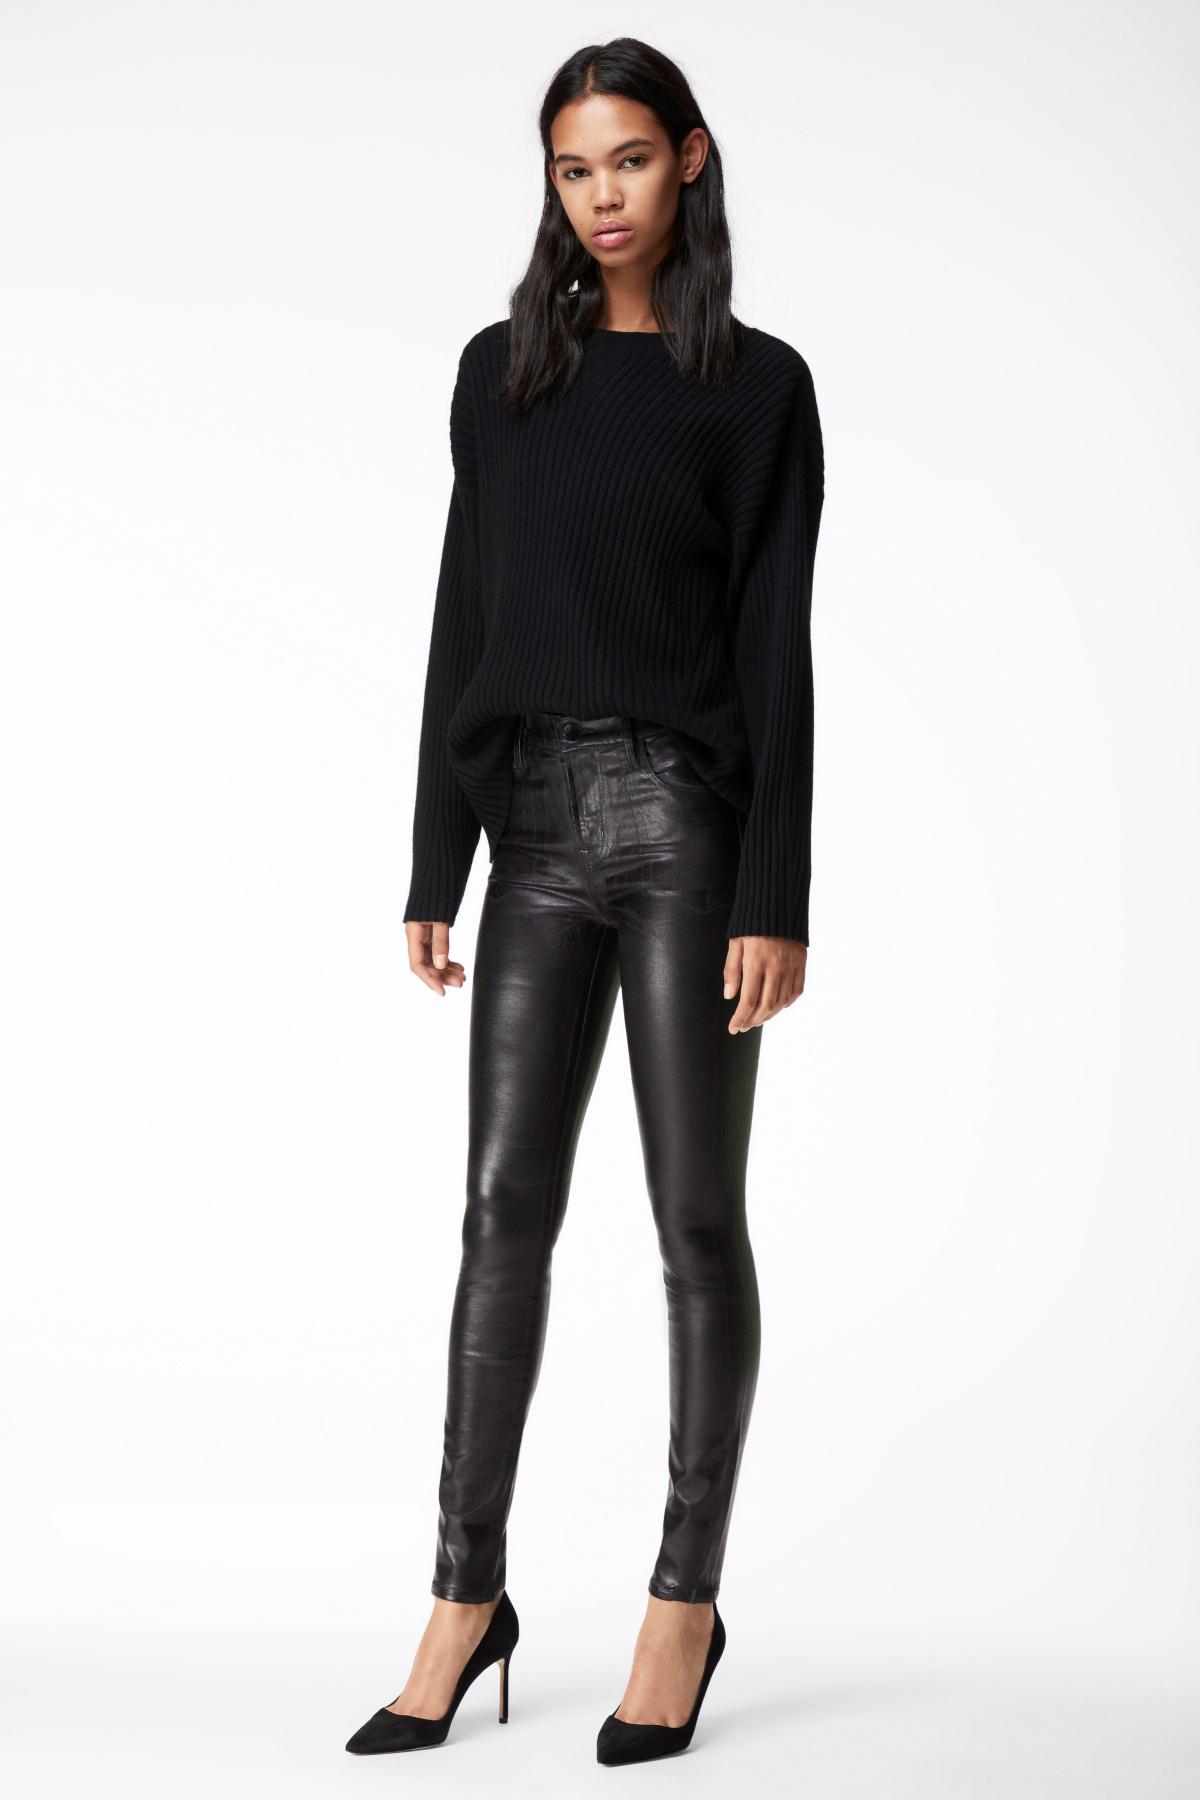 J Brand Maria High Rise Super Skinny Jeans in Galactic Black